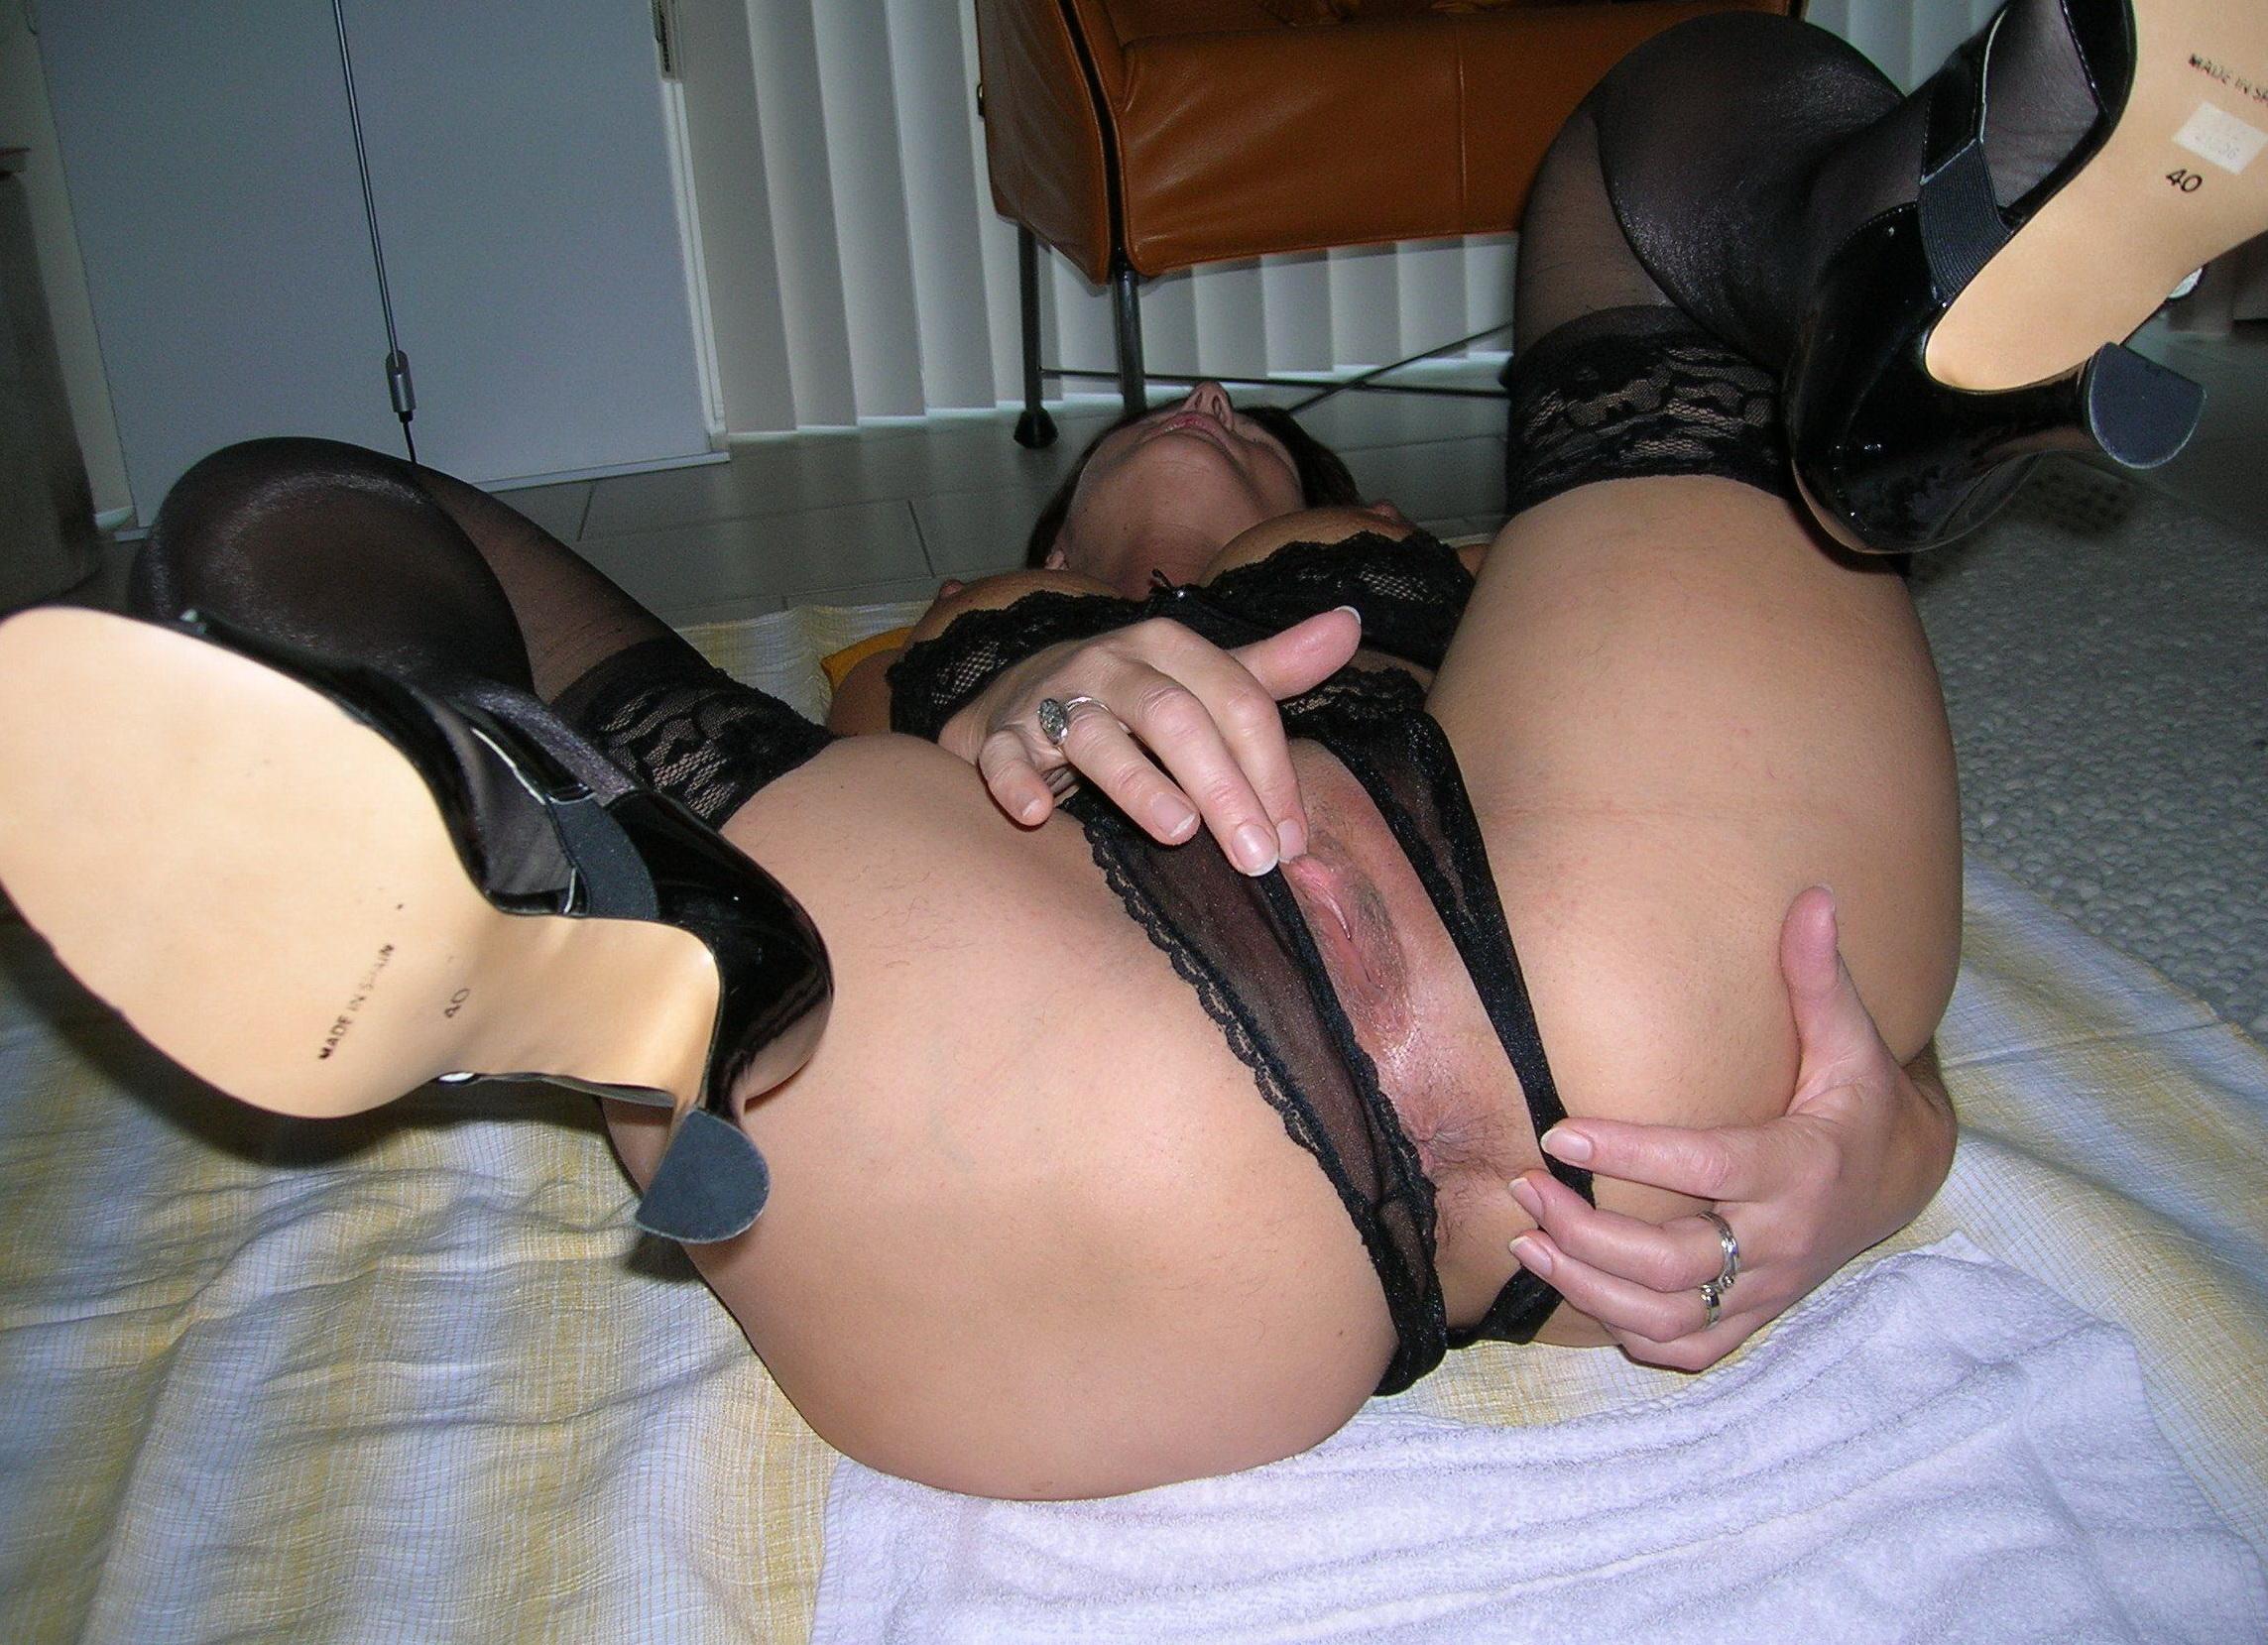 http://pbs-2.adult-empire.com/85/8570/030/pic/1.jpg